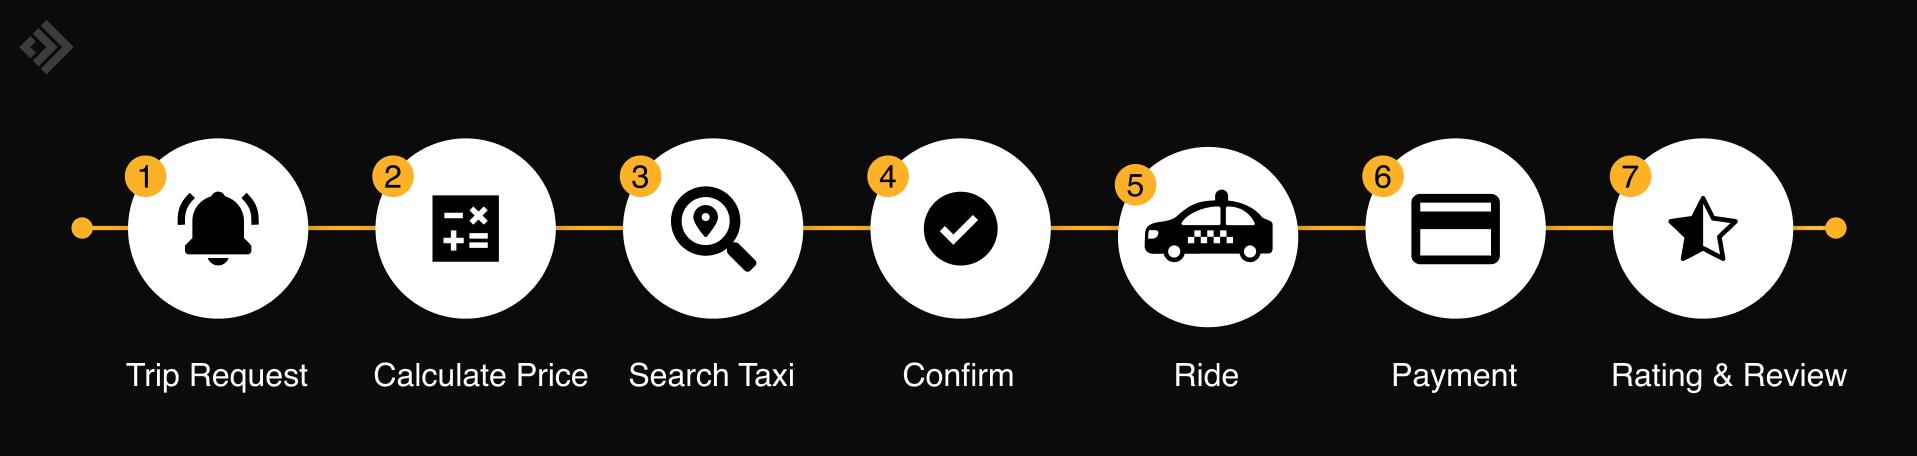 Taxi service business logic